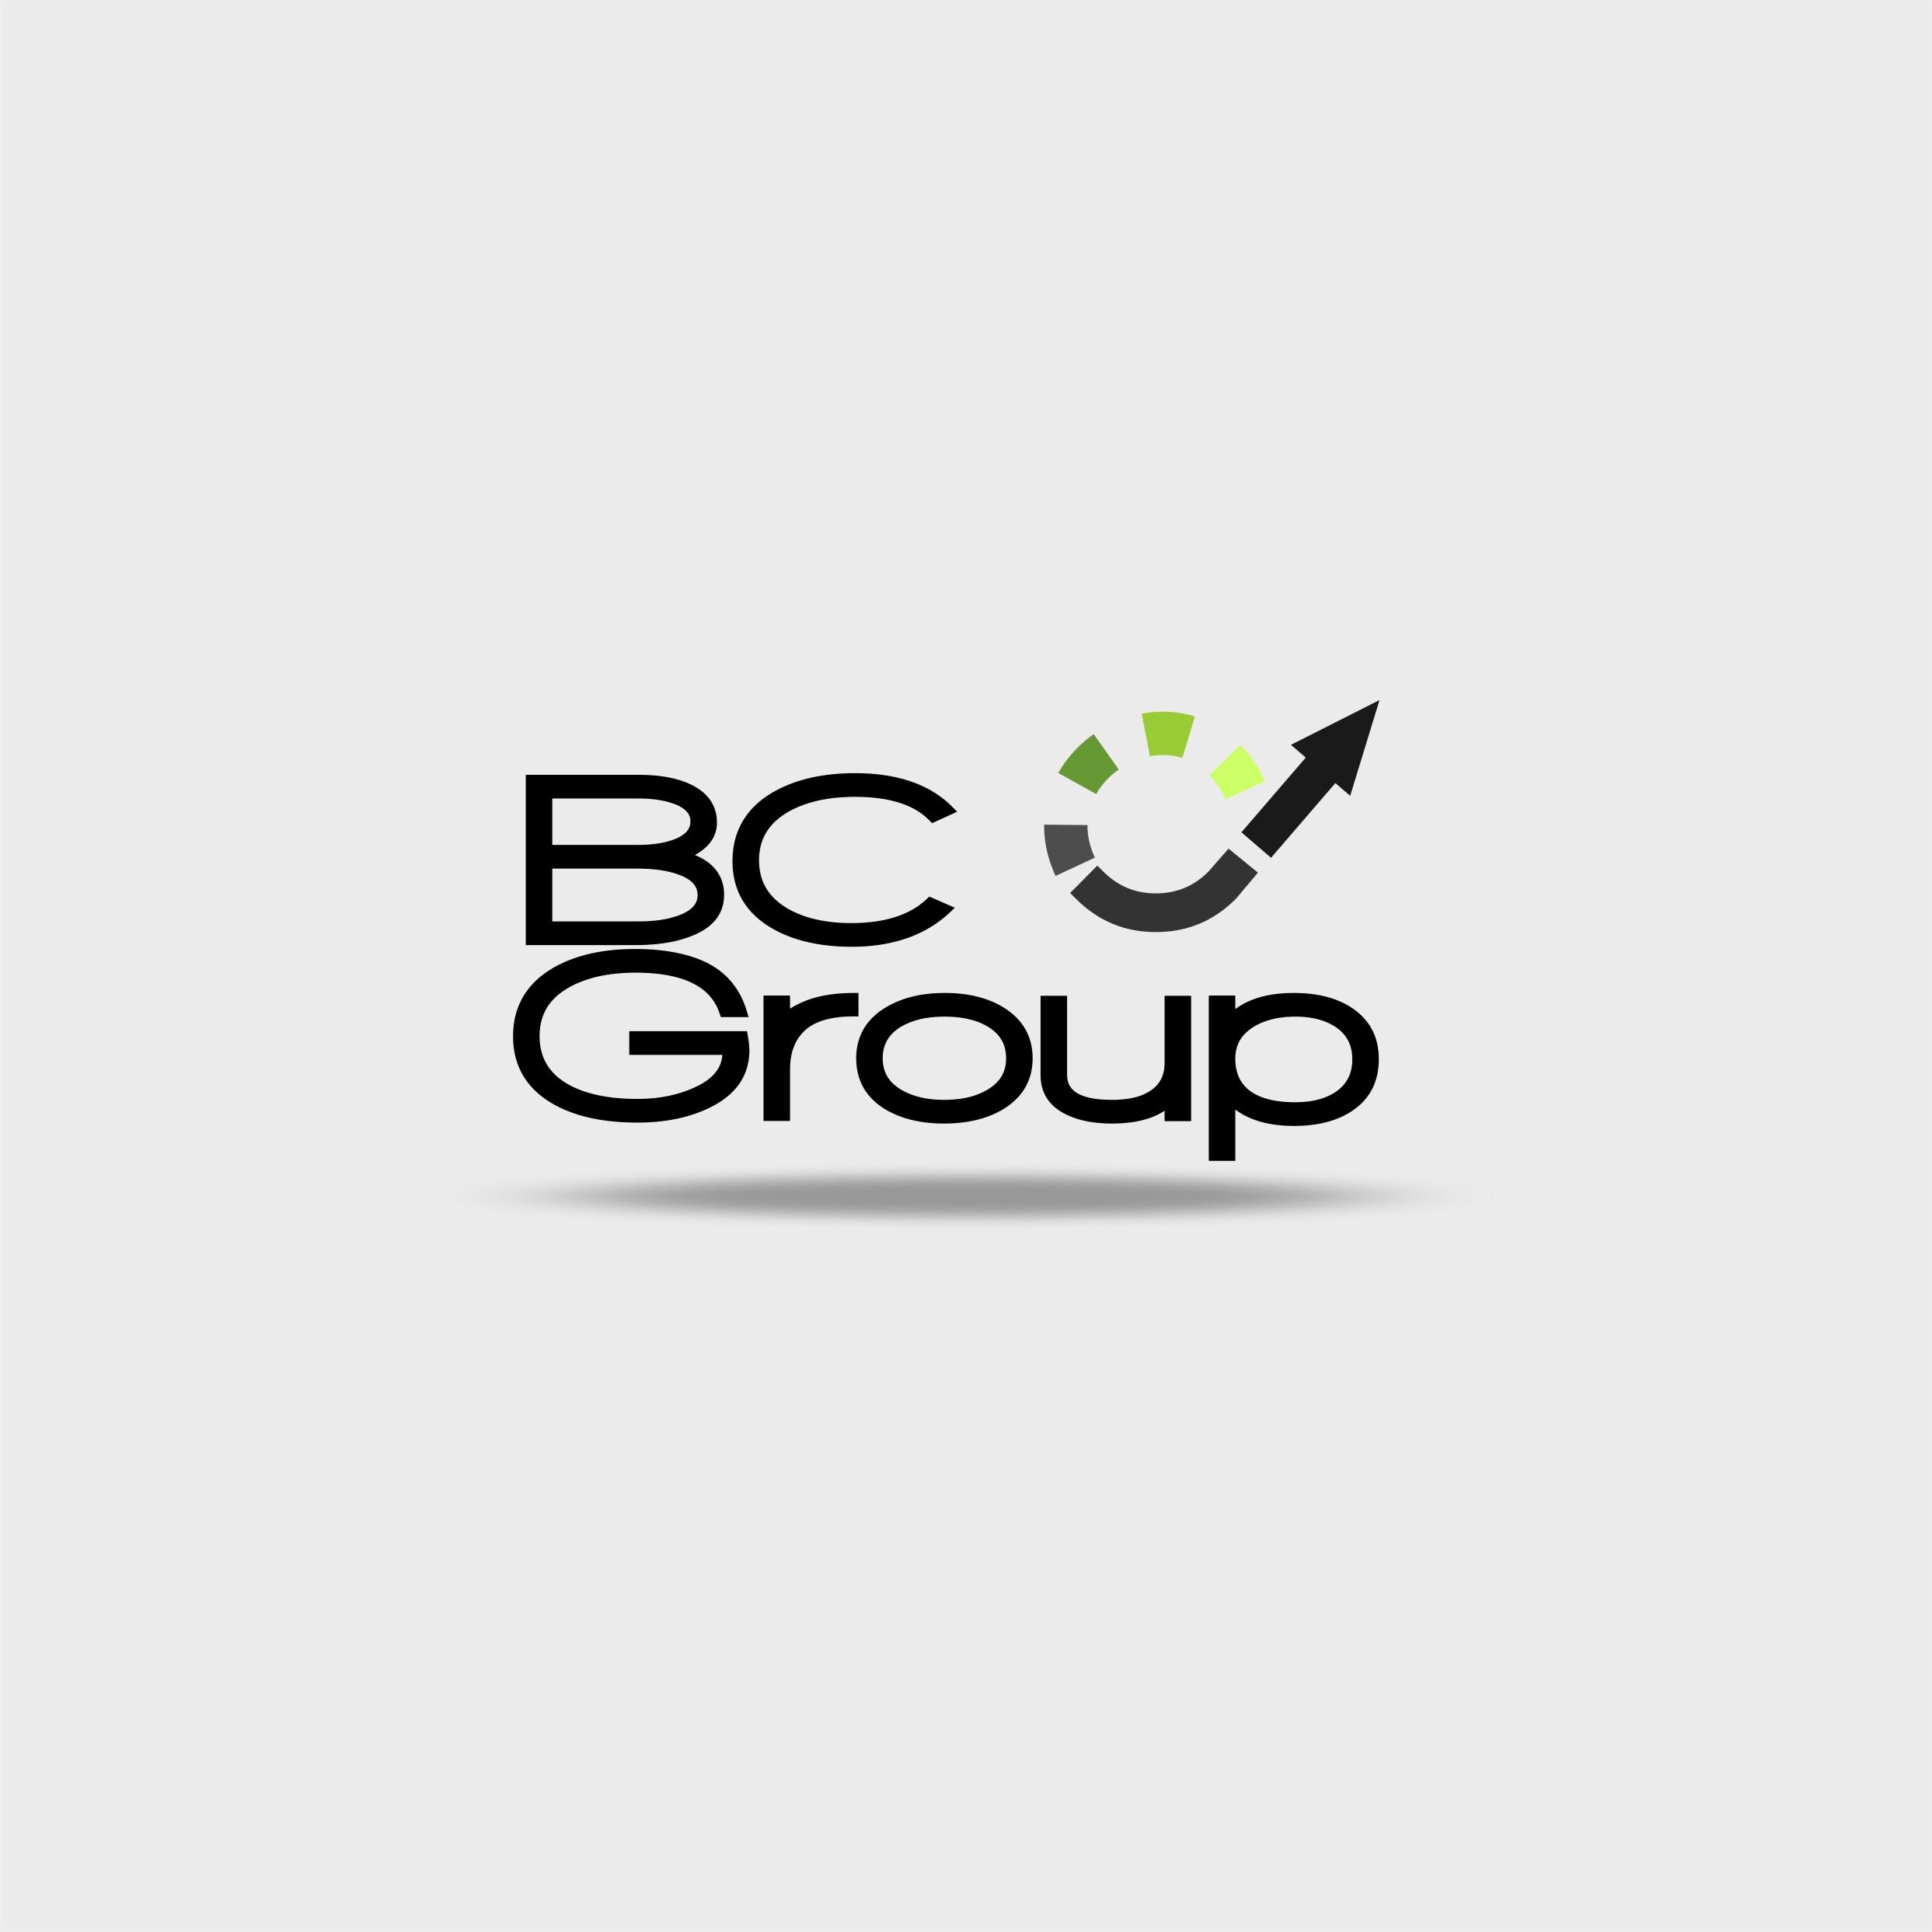 Be Creative Group